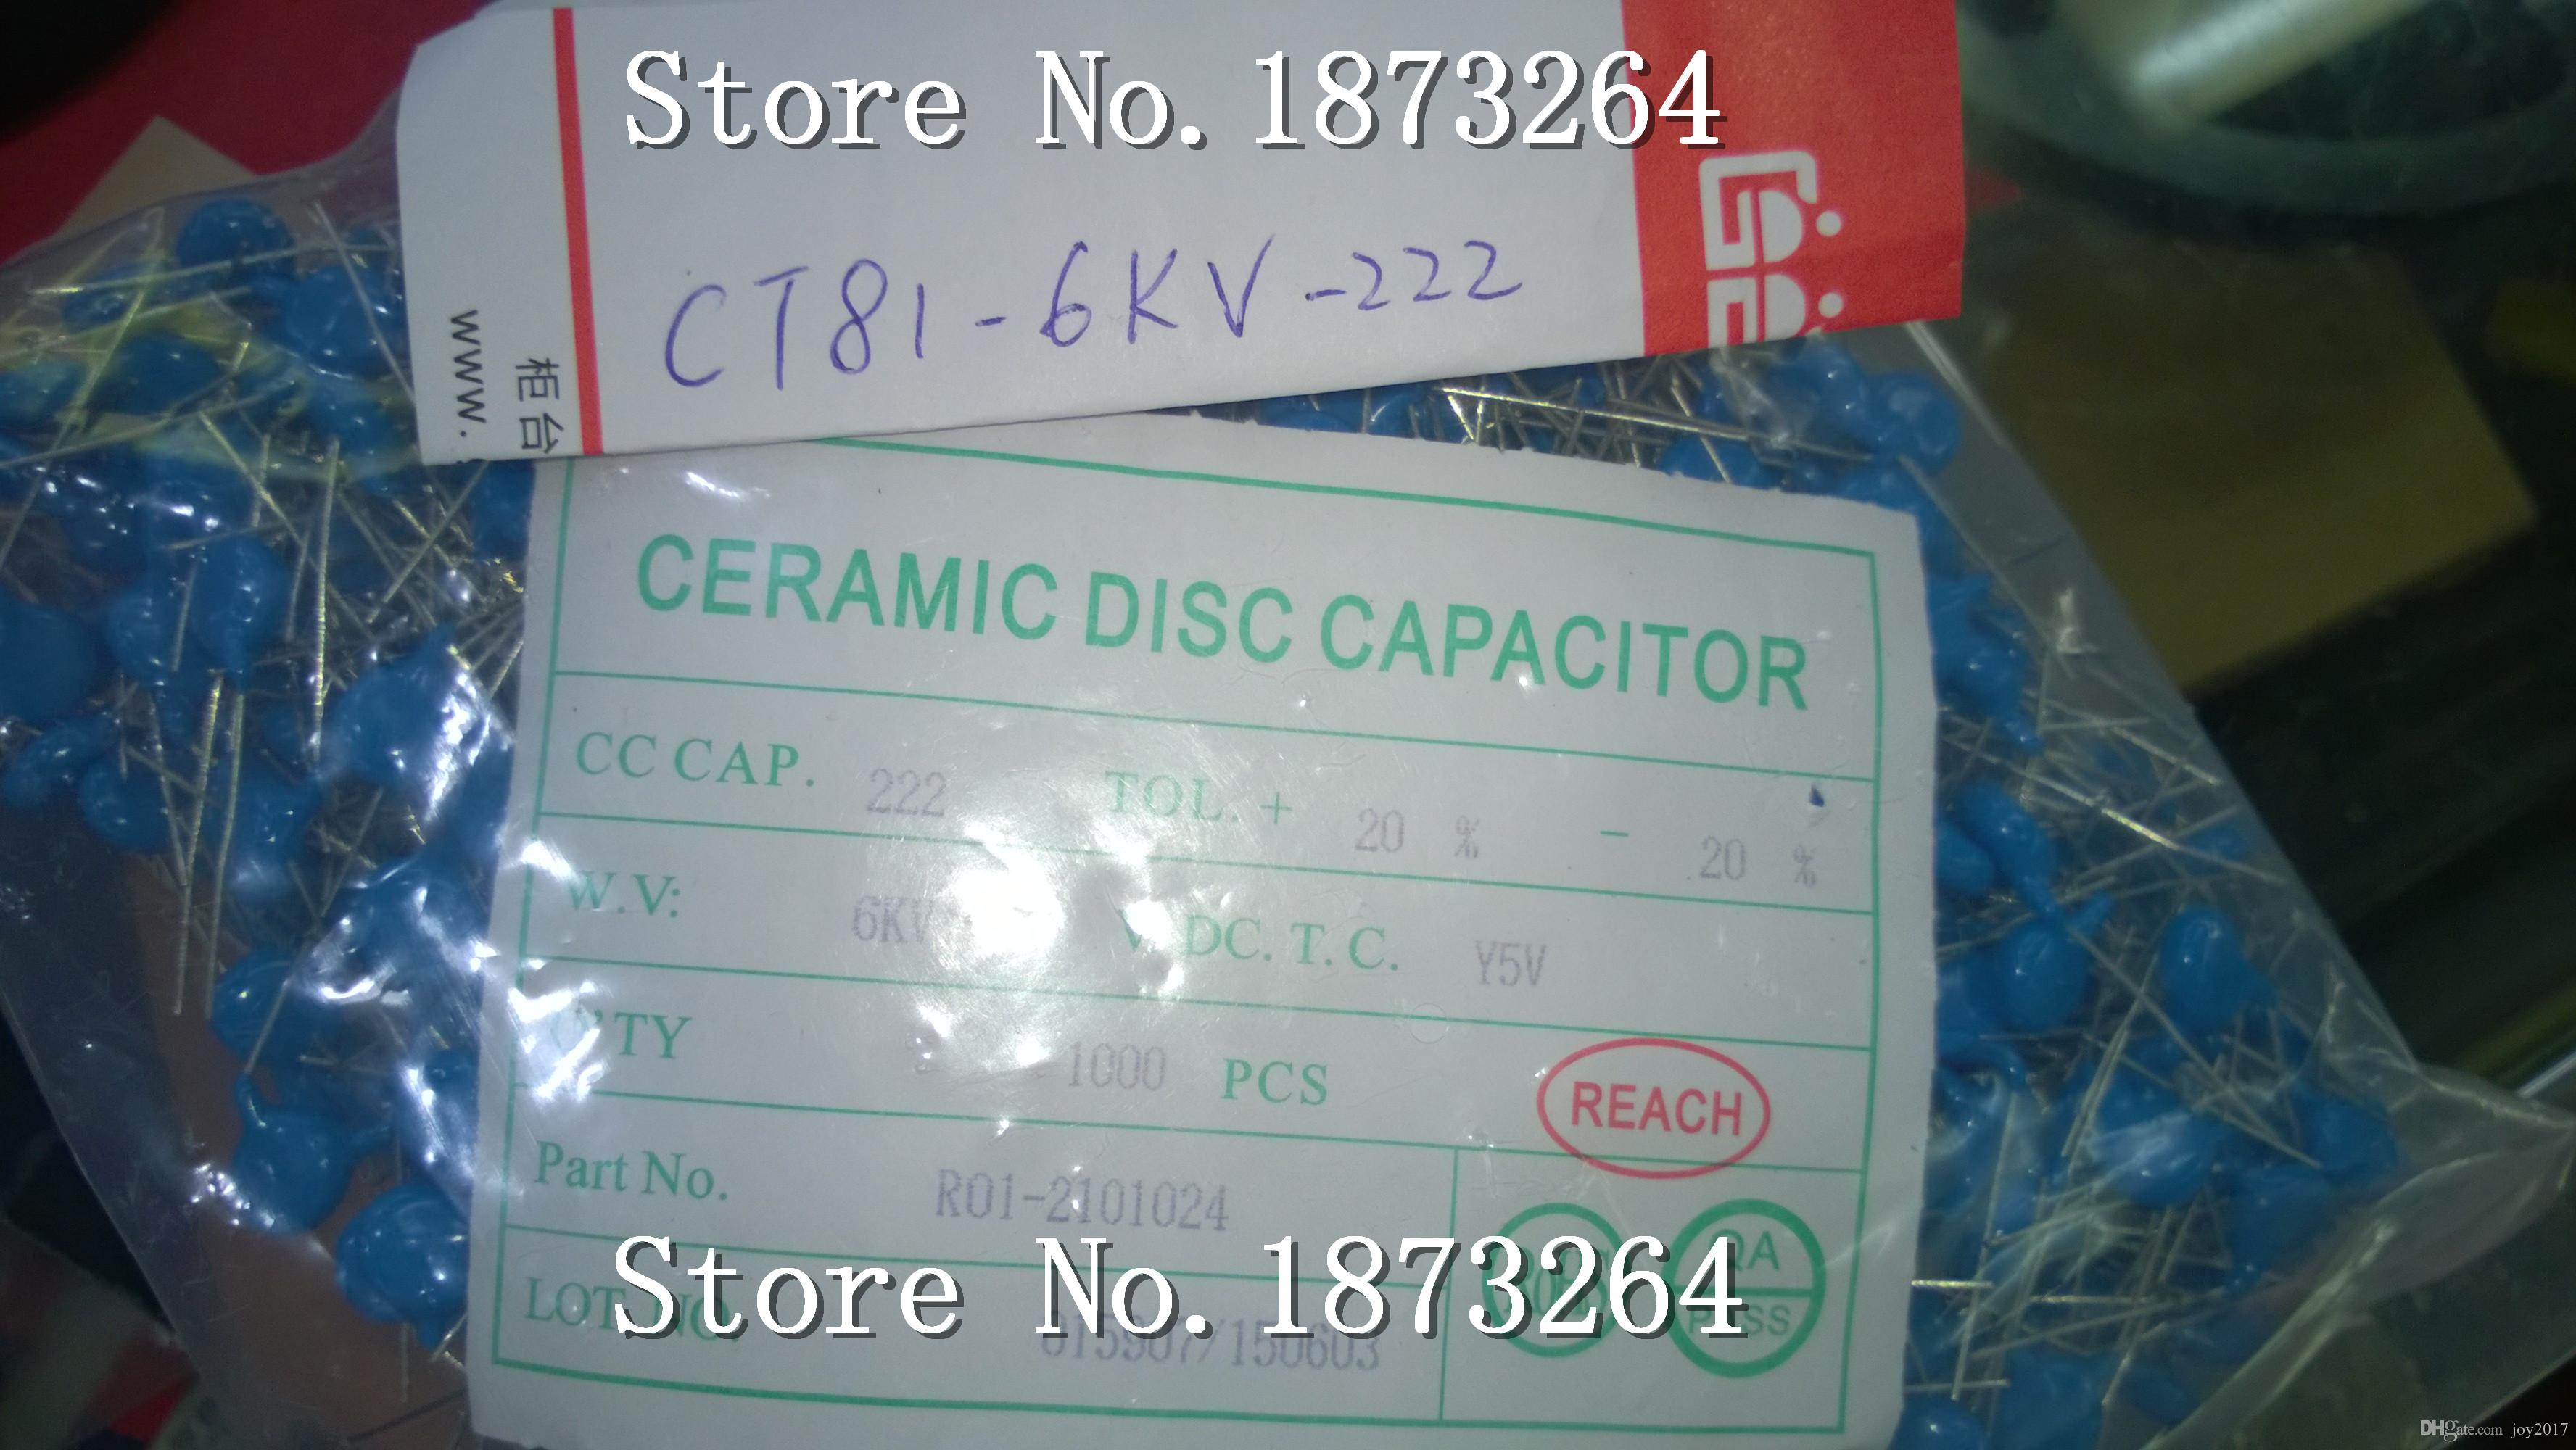 Freie shippingHigh Spannung keramische Kondensatoren CT81-6KV-222 6000V 2200pf Motherboard Kondensatoren 100PCS / LOT